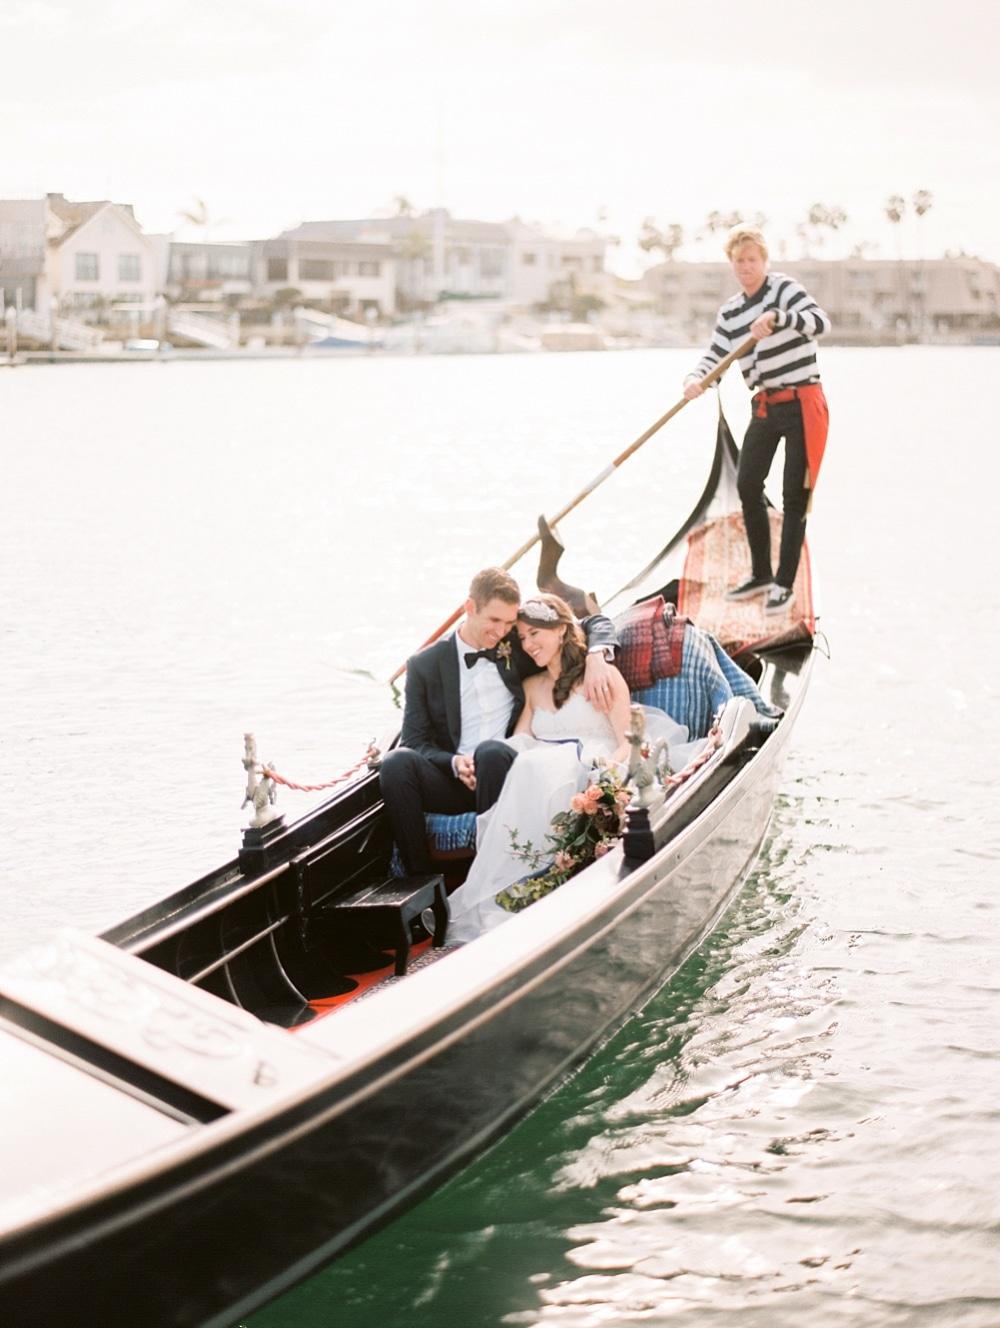 Kristin-La-Voie-Photography-San-Diego-Wedding-Photographer-18